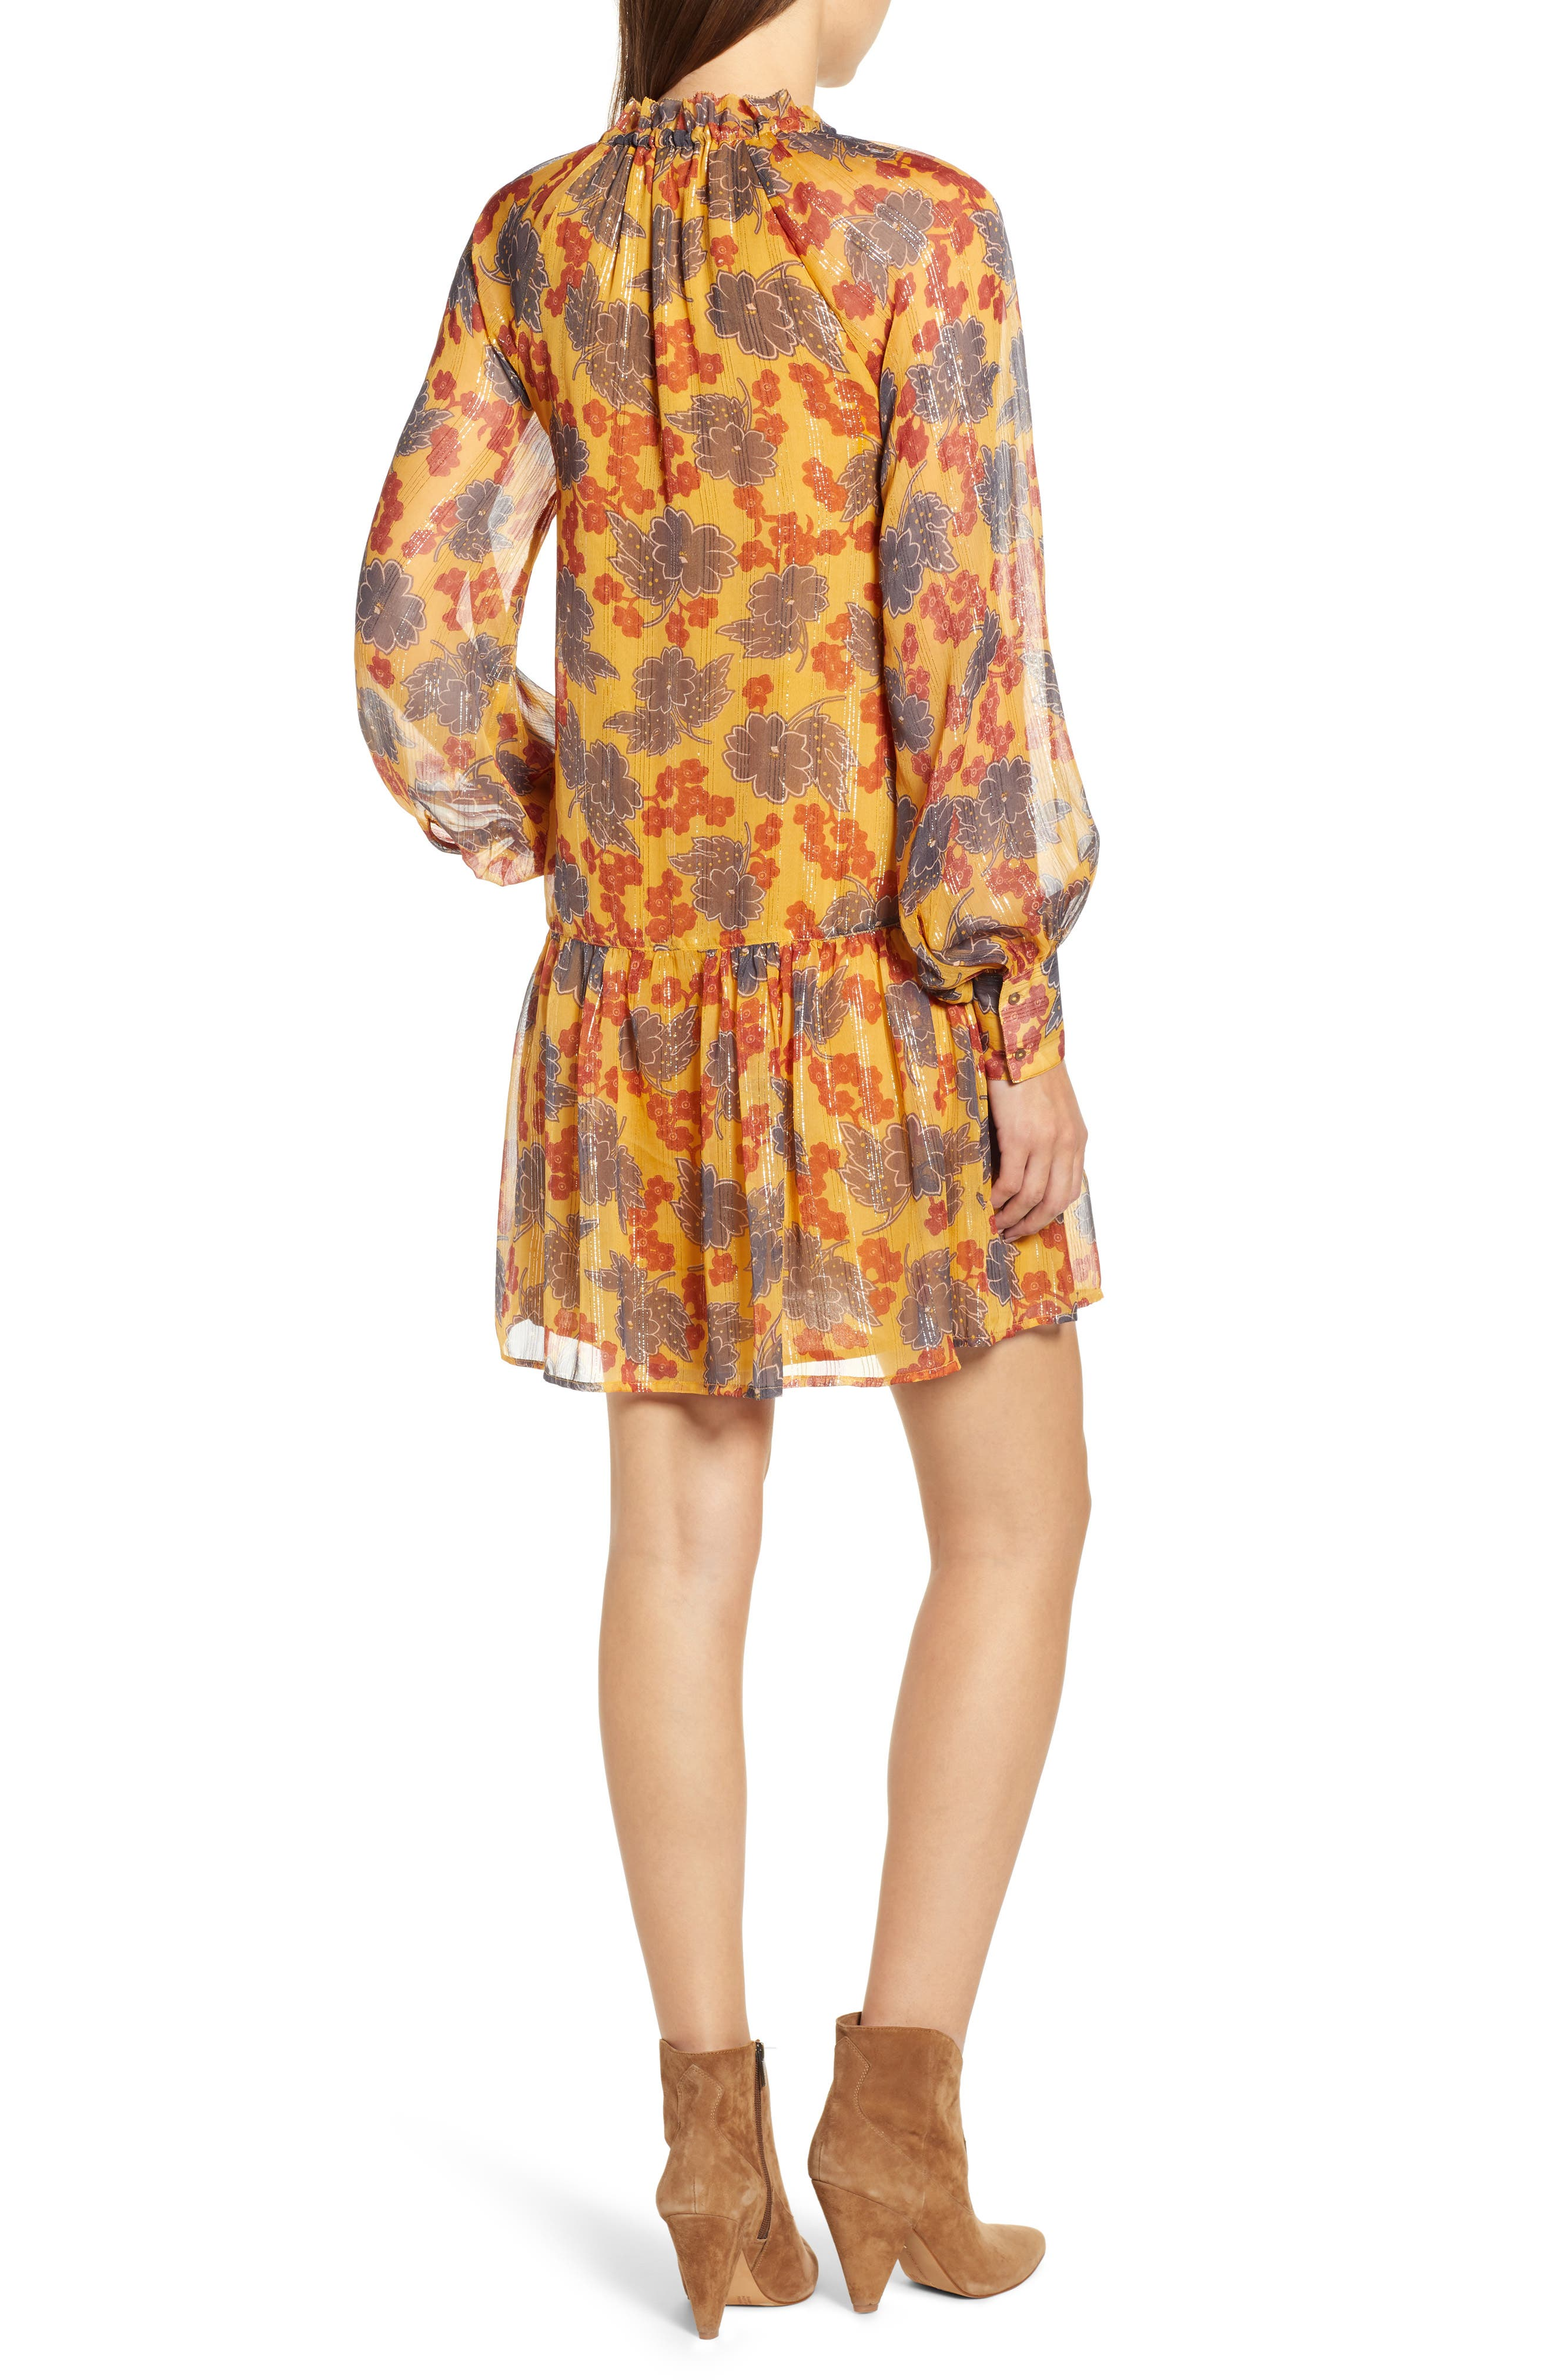 Metallic Stripe Floral Print Dress,                             Alternate thumbnail 2, color,                             YELLOW AND BURGUNDY